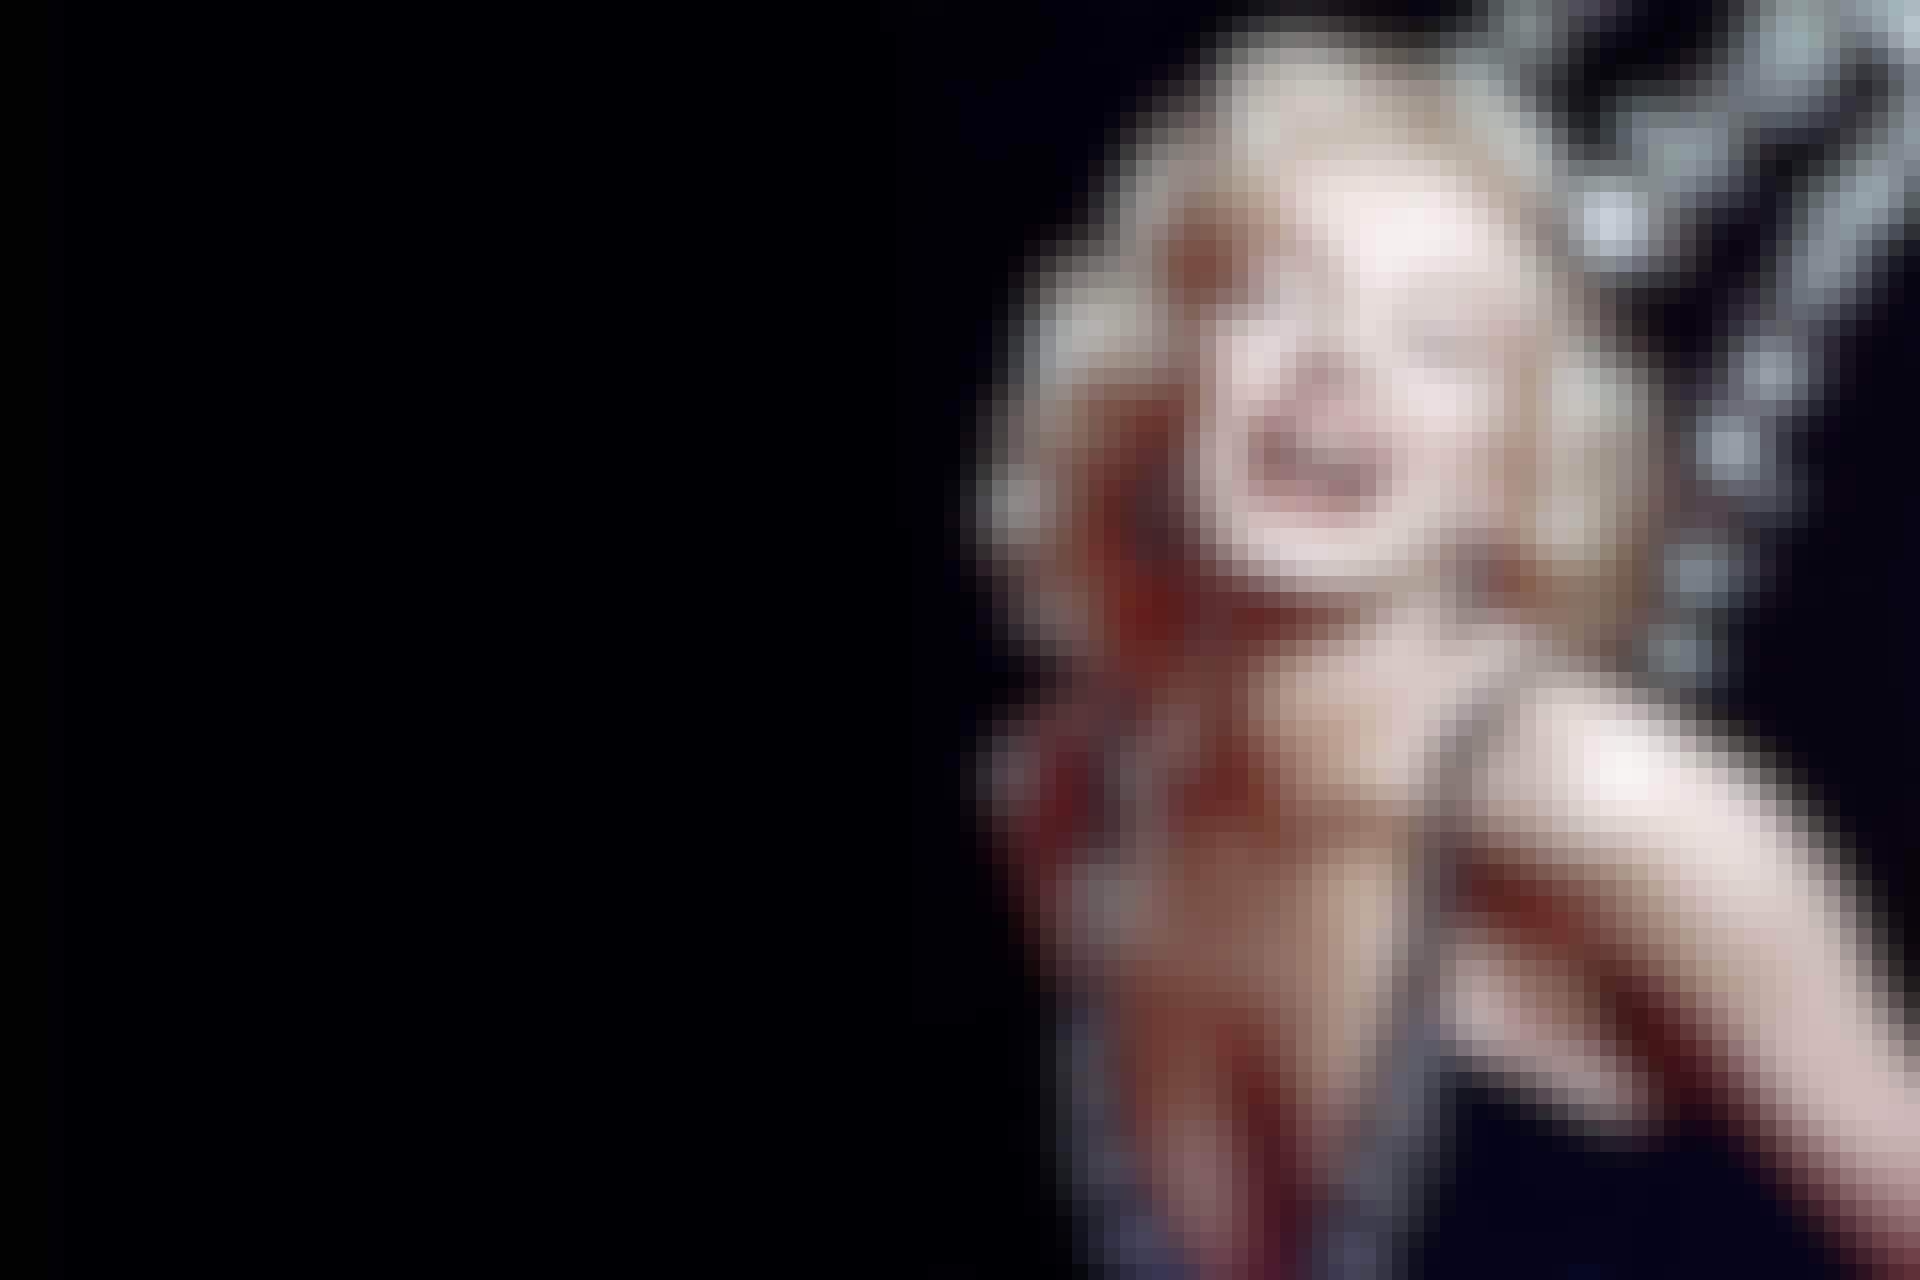 Marilyn Monroe black background